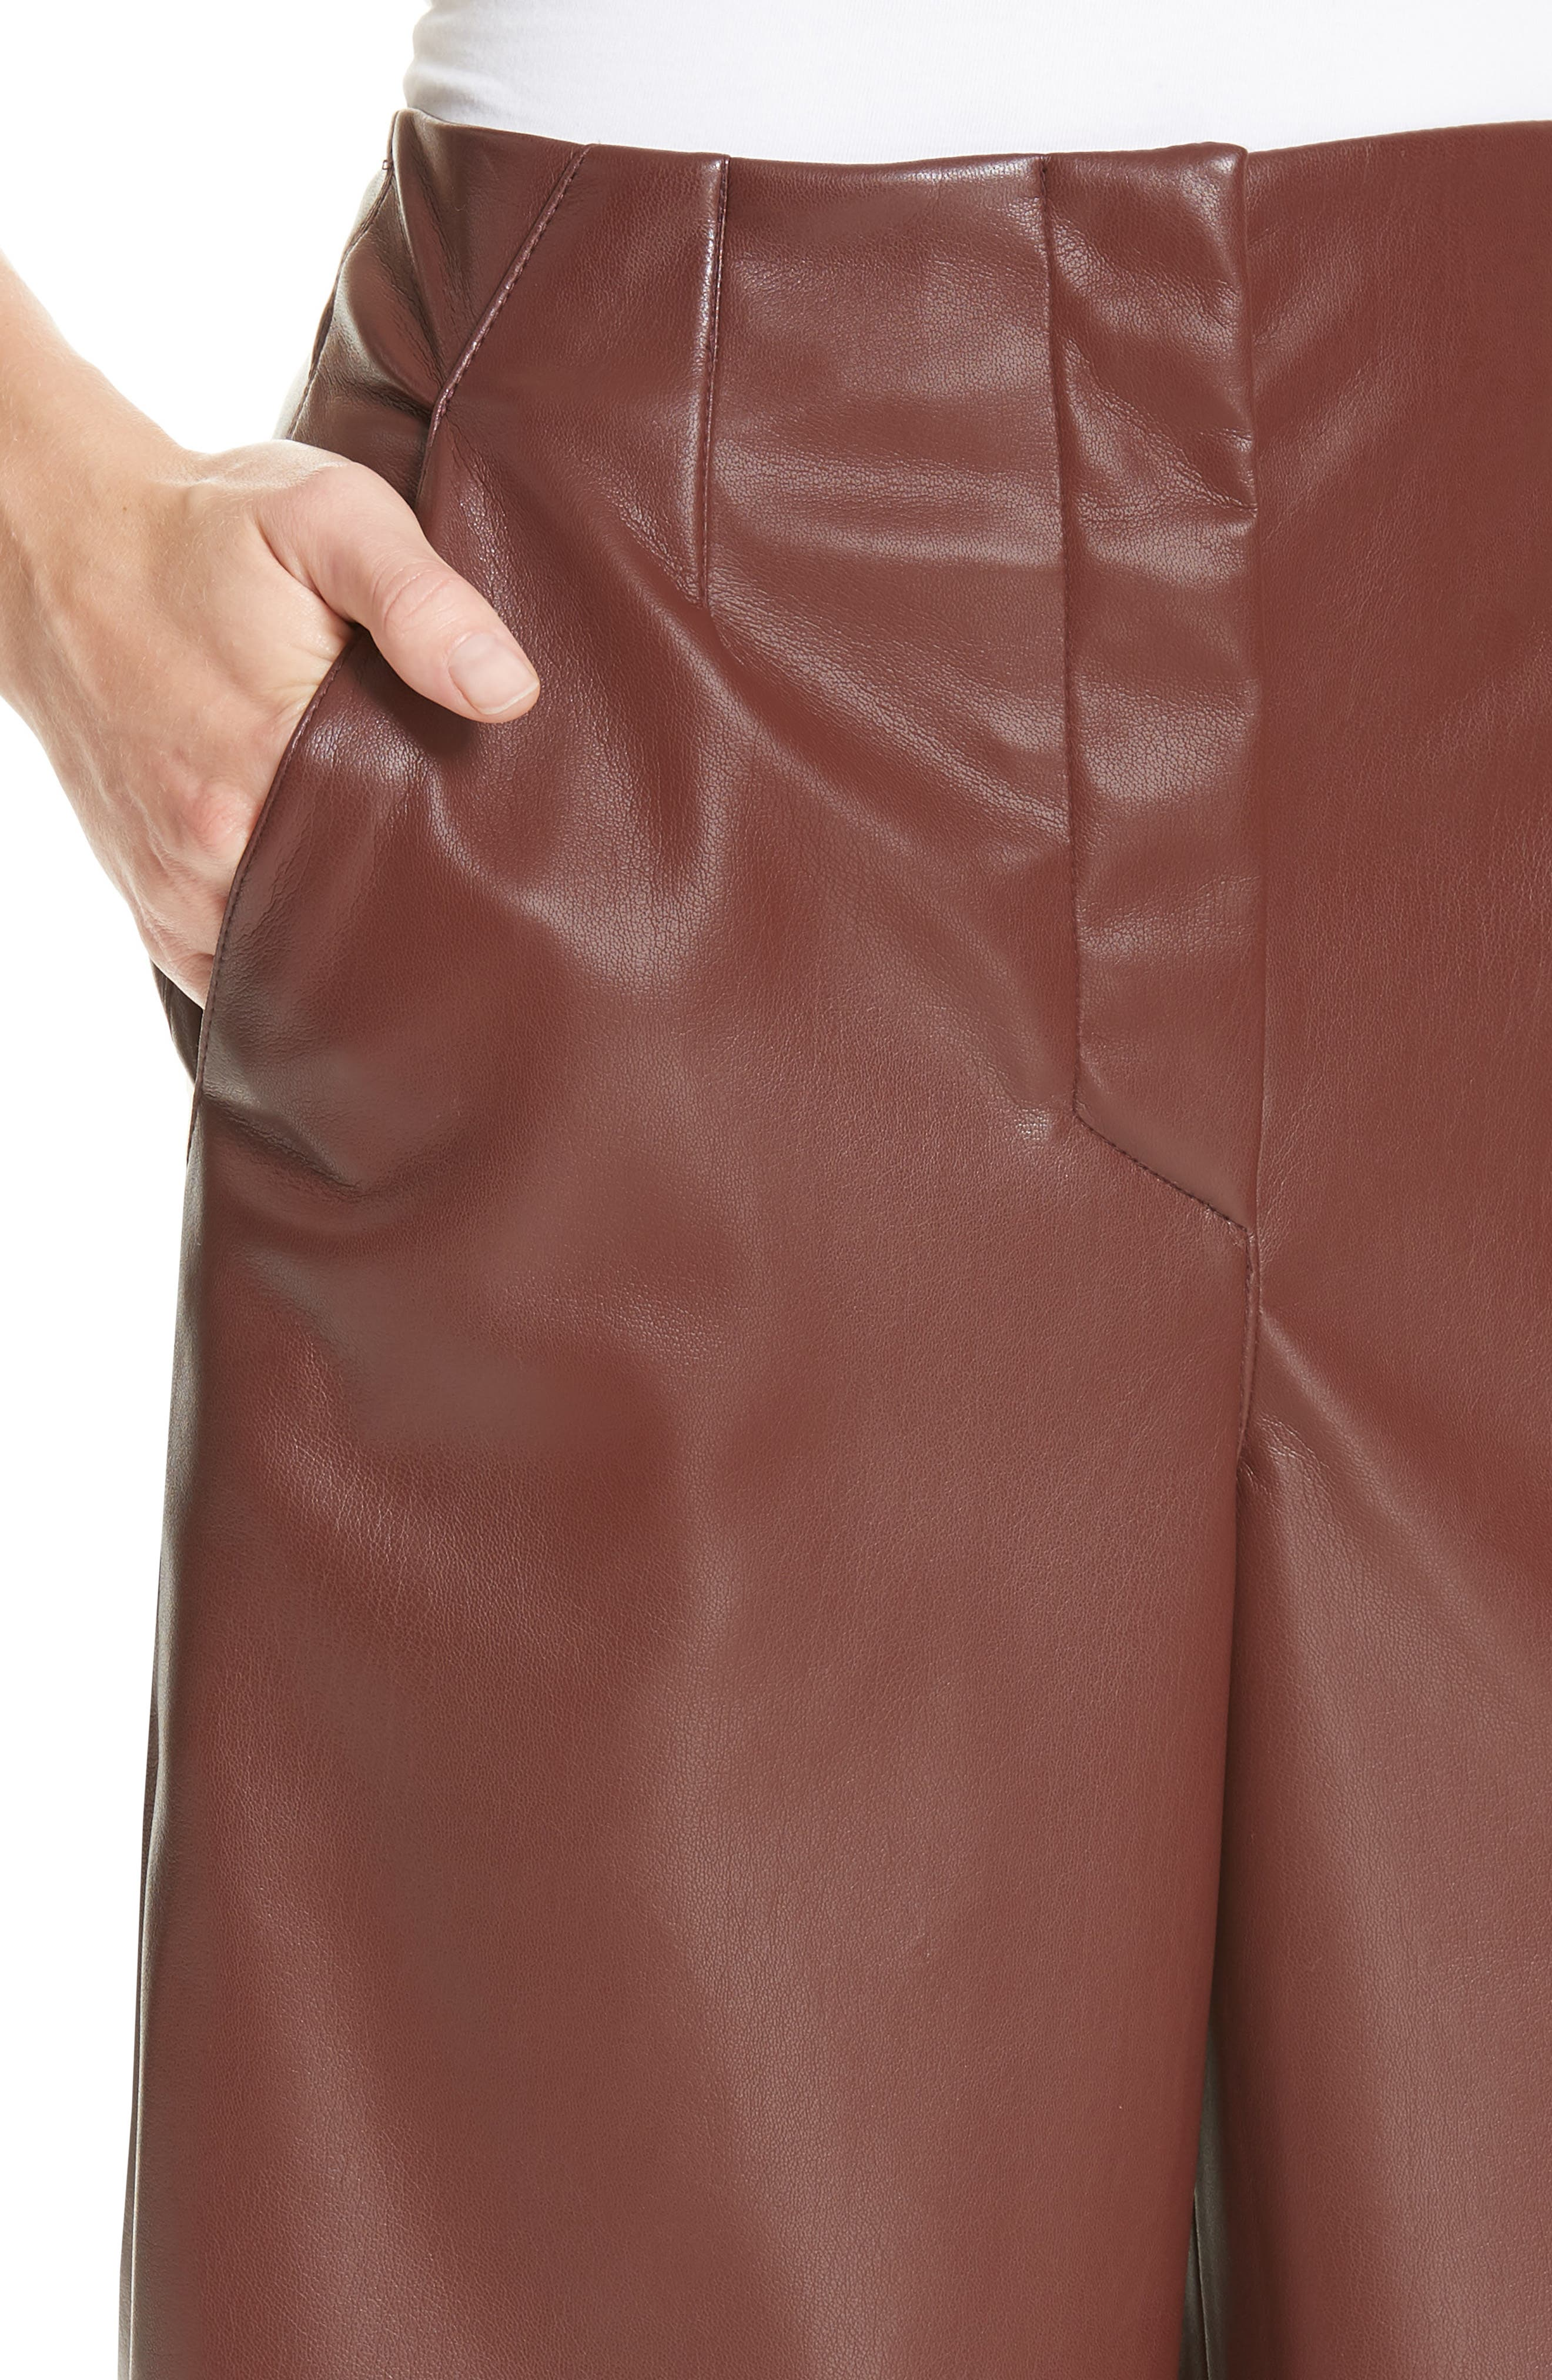 Africa Faux Leather Wide Leg Crop Pants,                             Alternate thumbnail 4, color,                             509